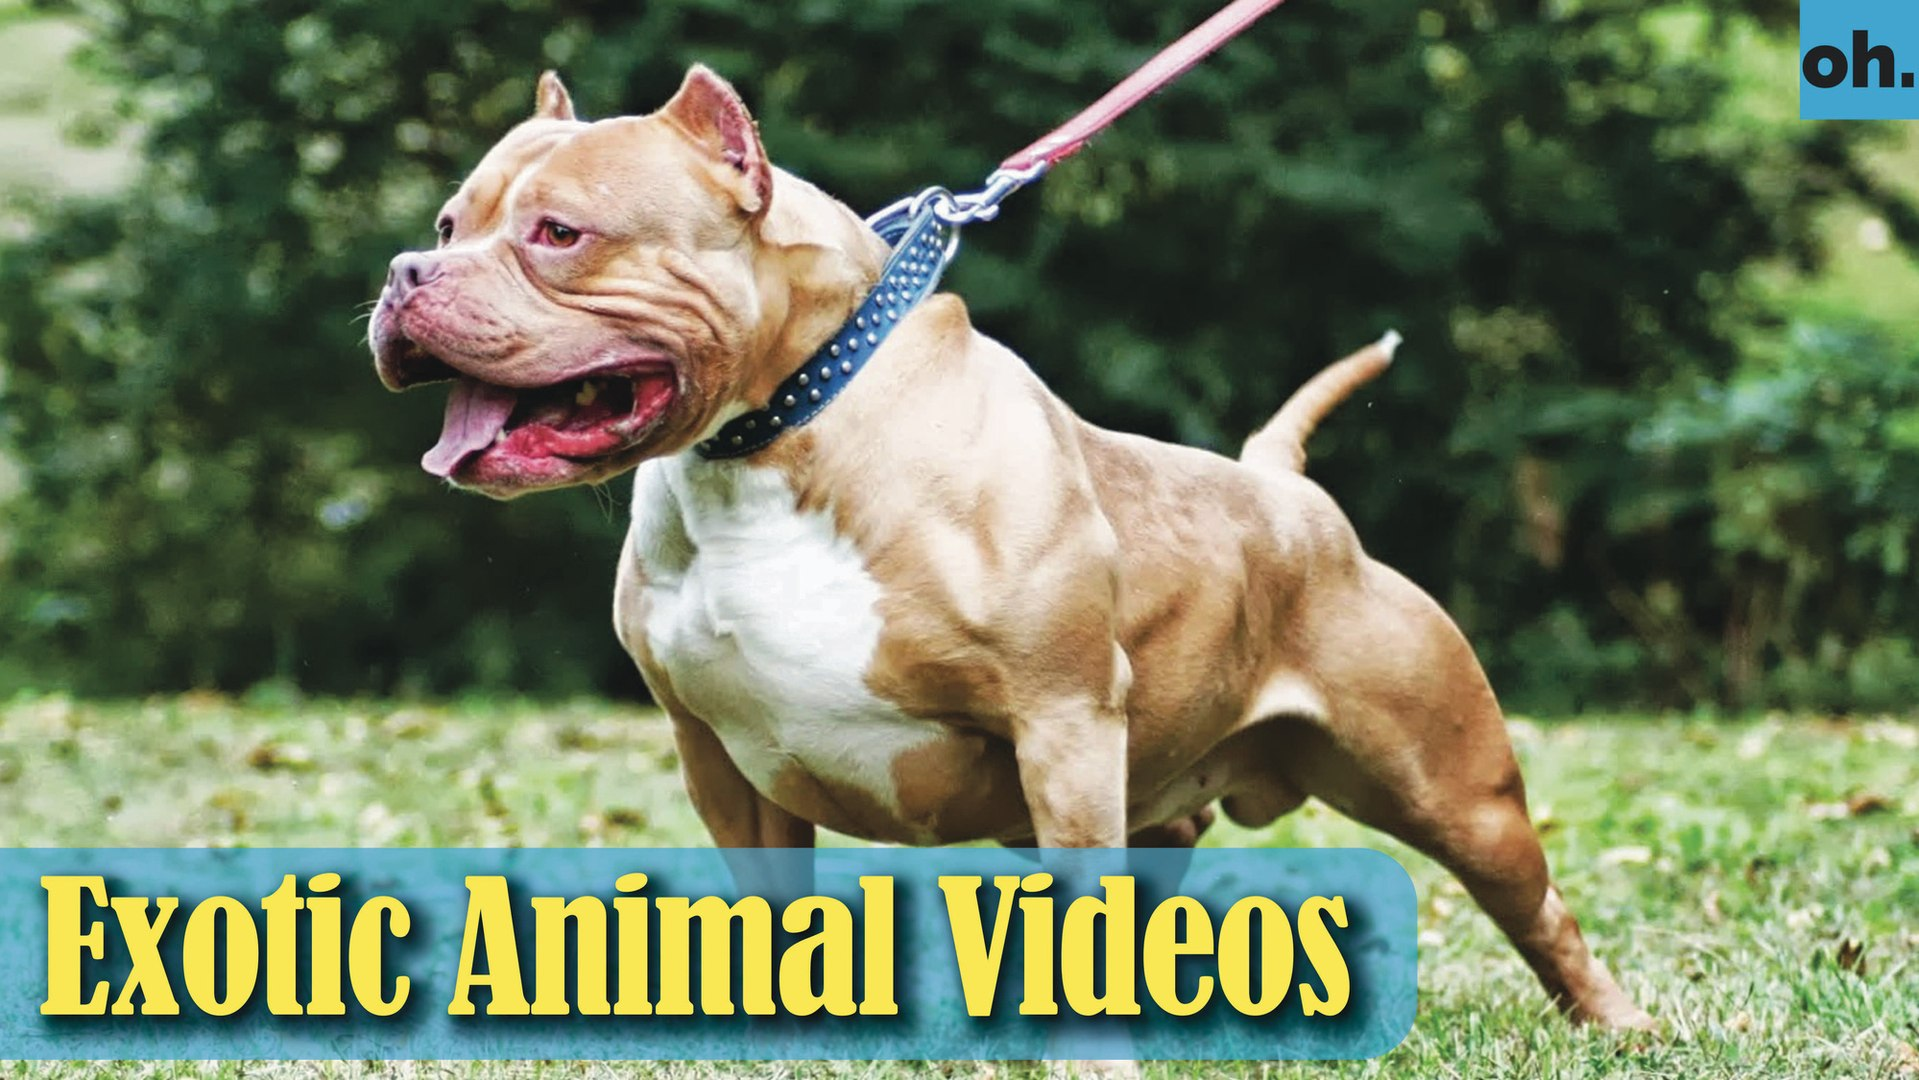 Animal Video - Endangered Animals - Extinct Animals - Rare Animals Zoo - Exotic Animals For Sale P4